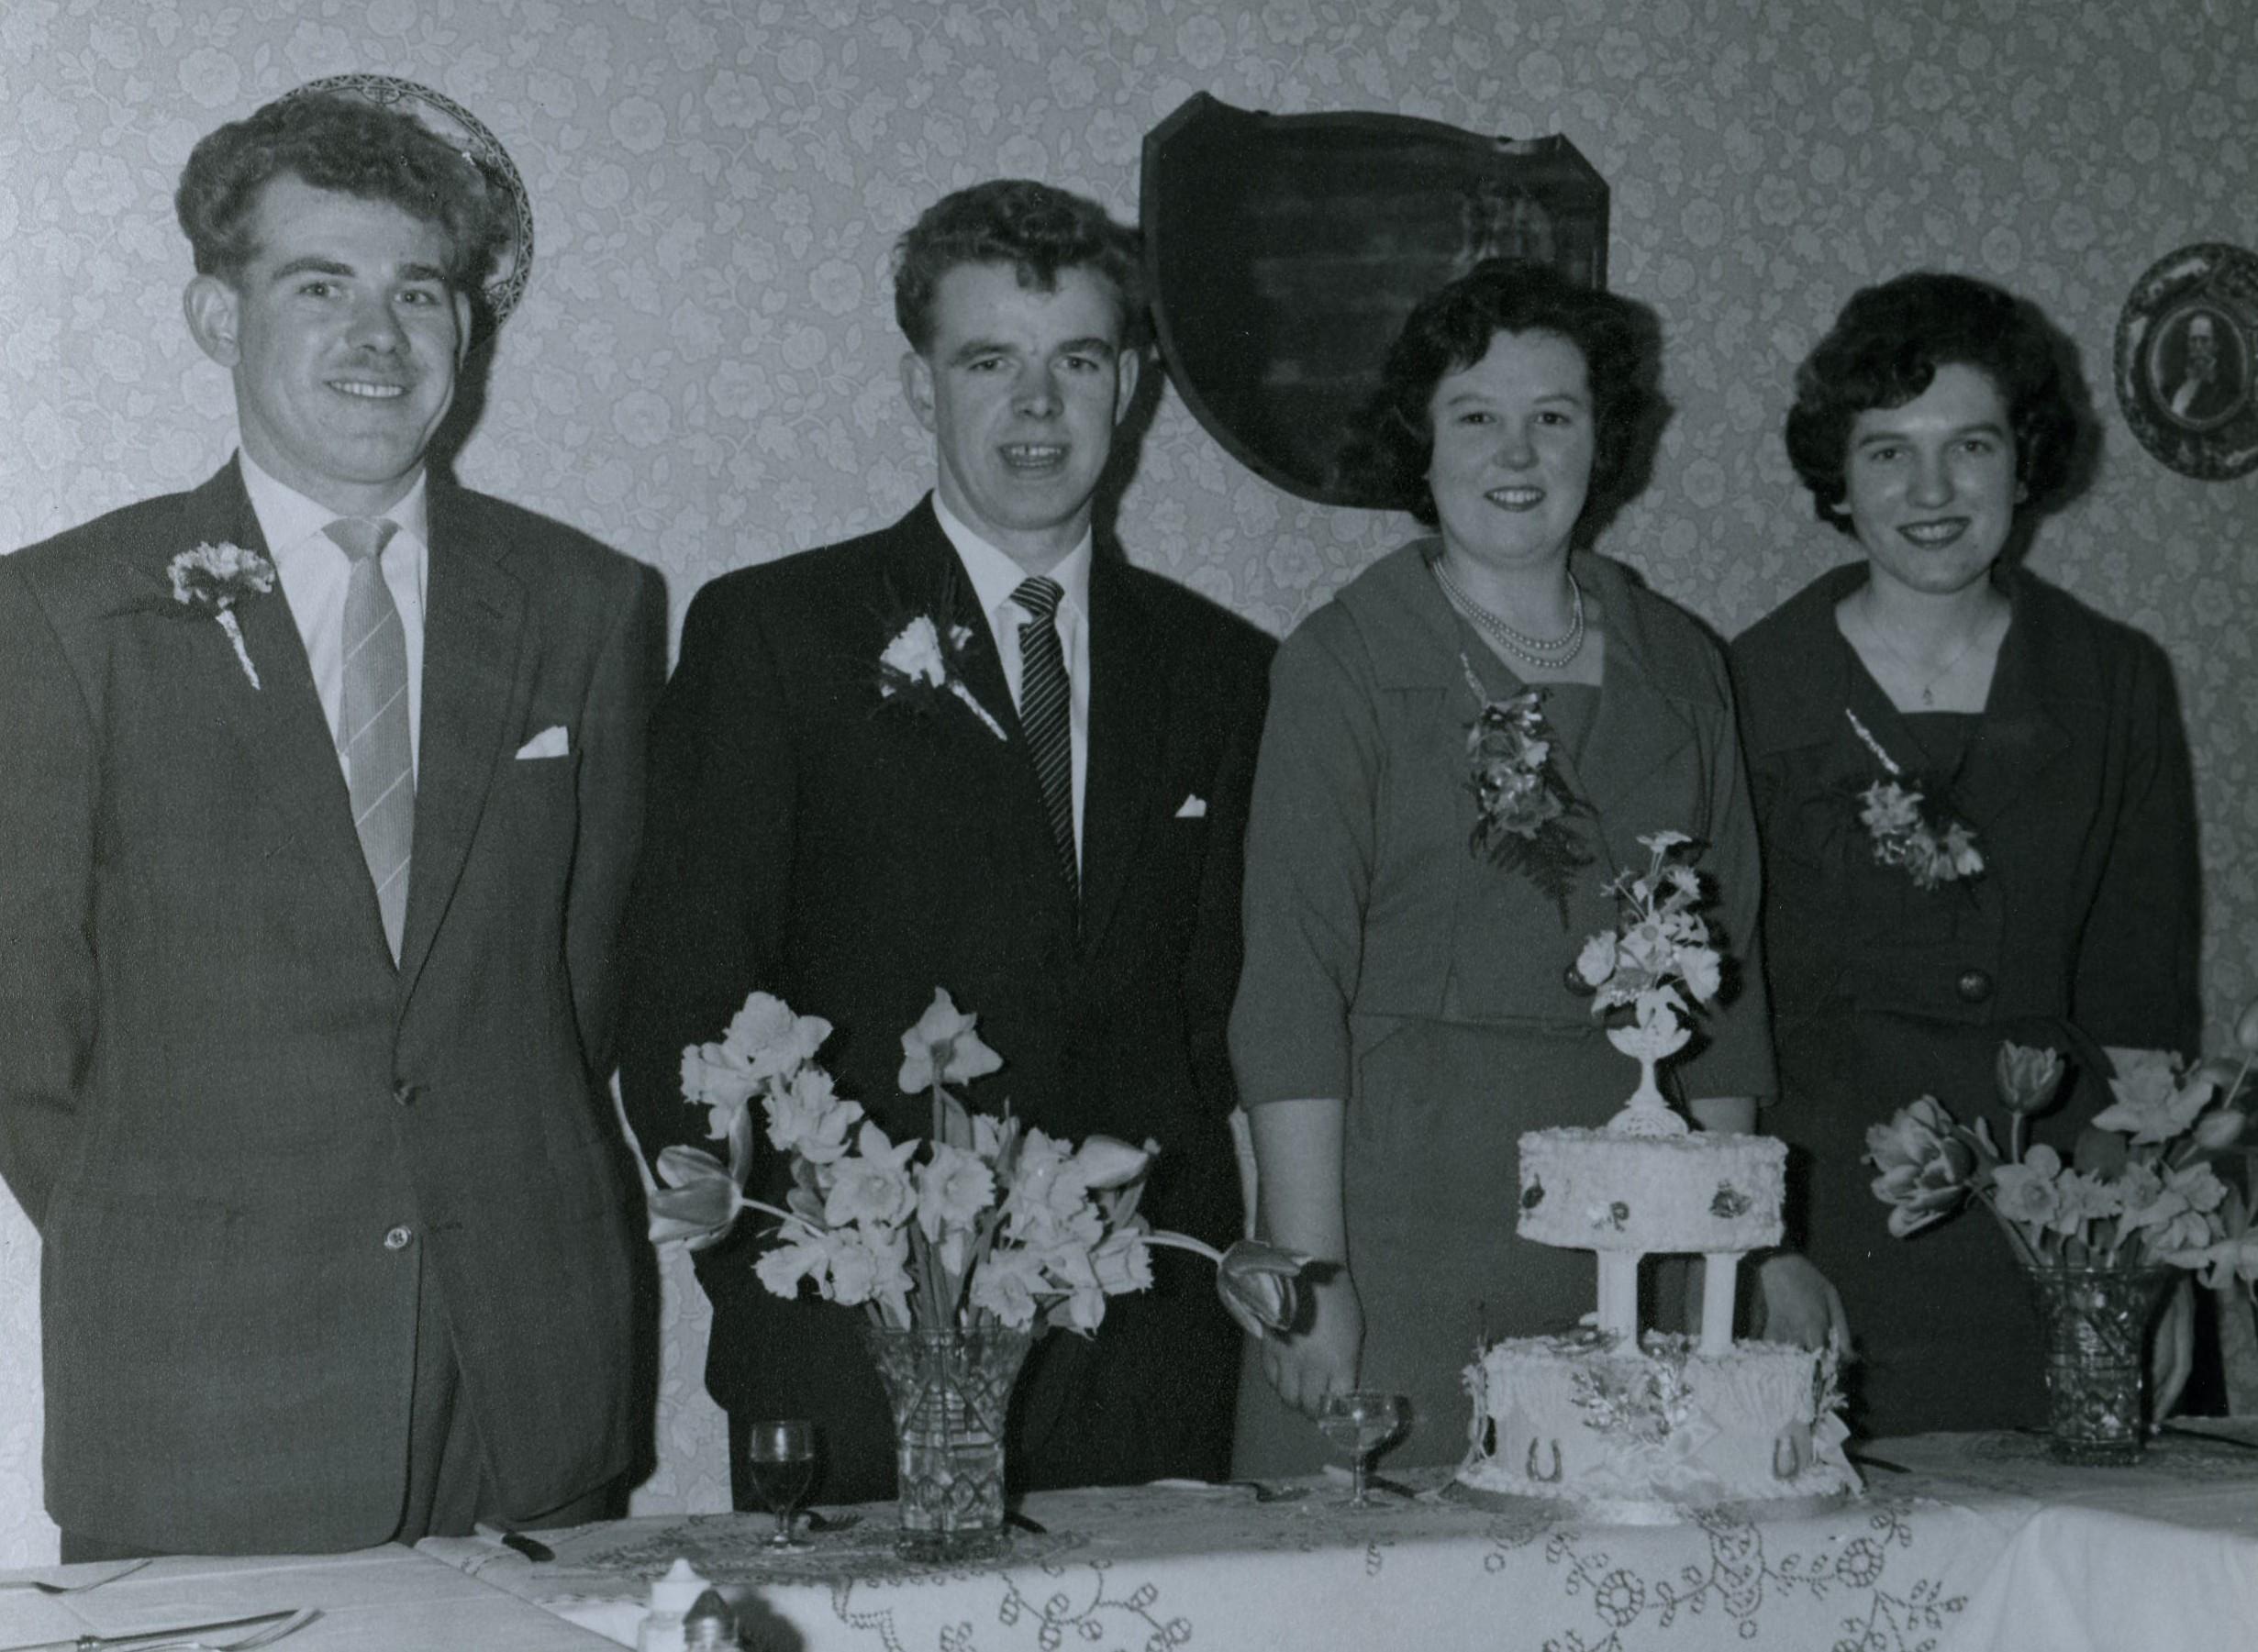 Rab Petrie & Liz Monachan's  Wedding